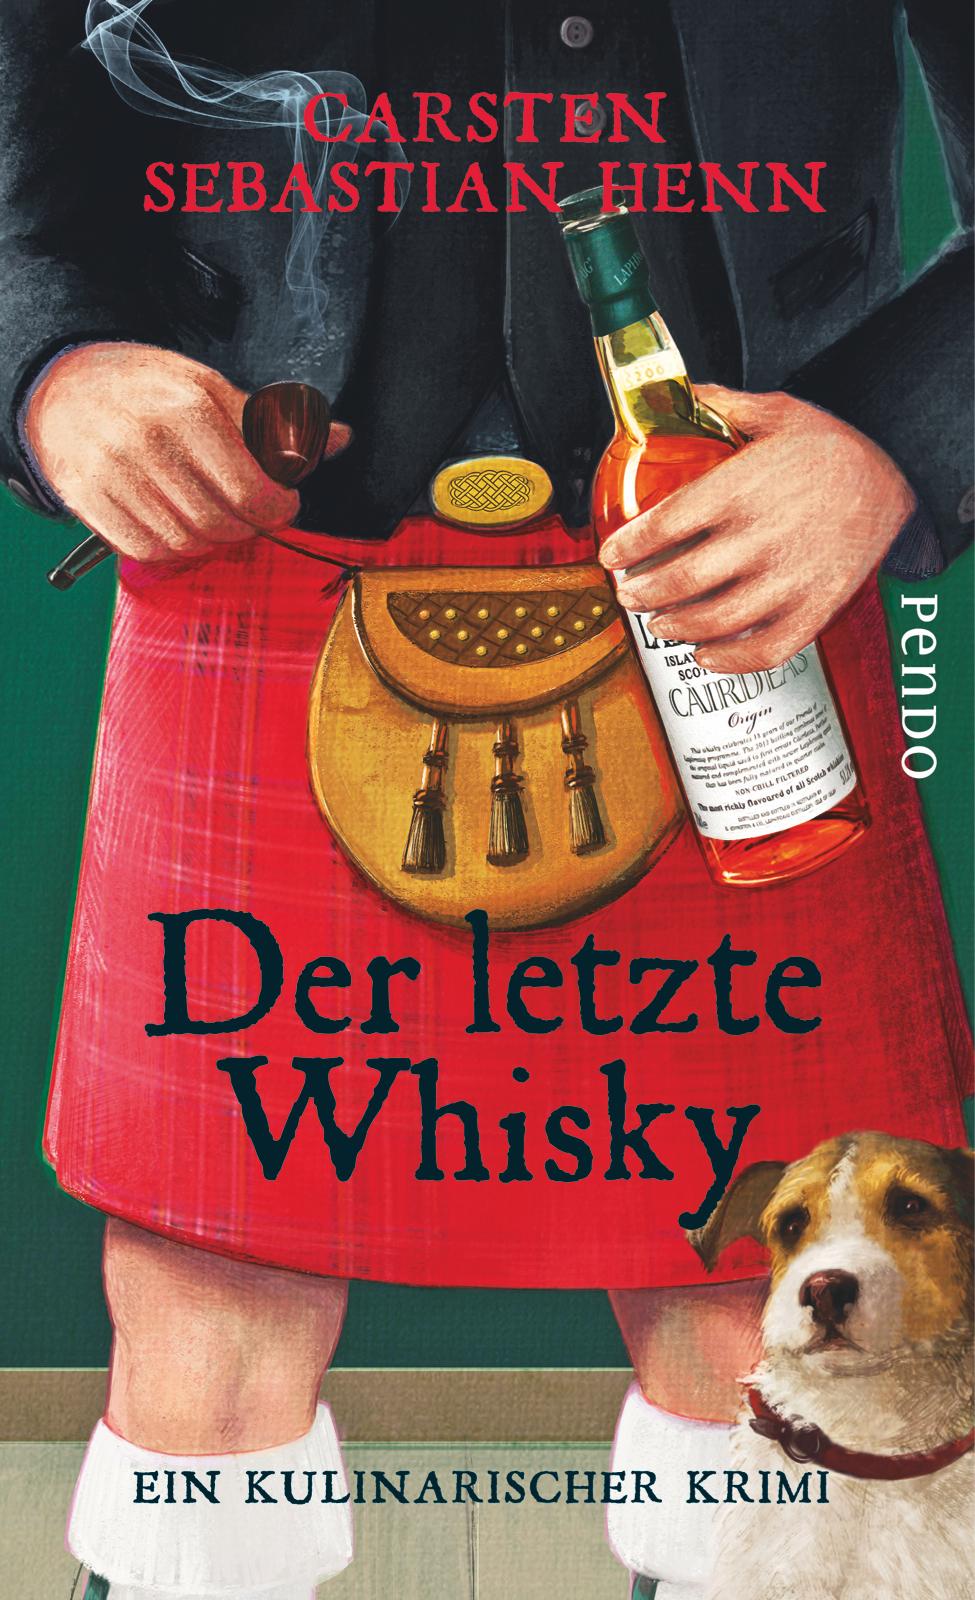 Der letzte Whisky - Cover